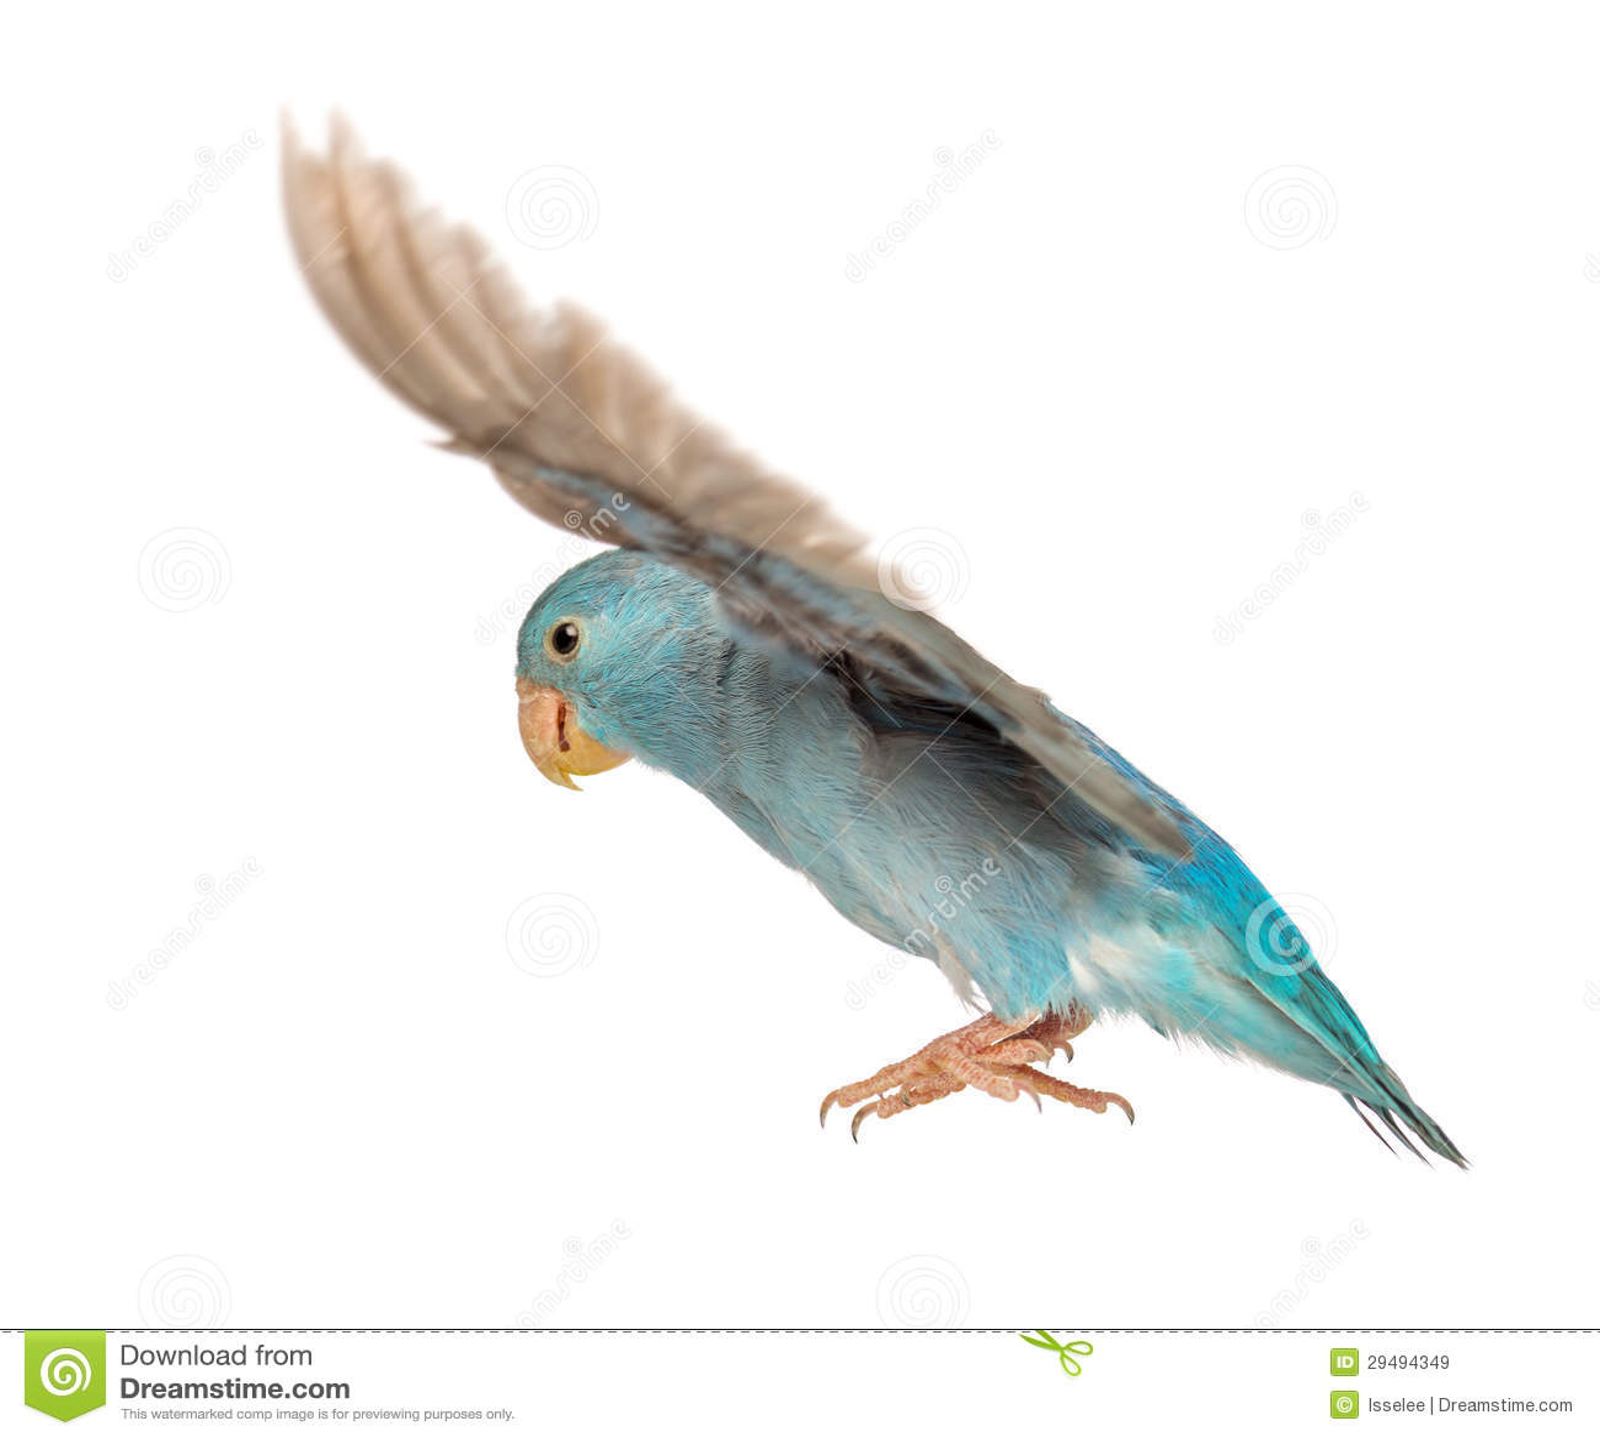 Pacific Parrotlet, Forpus coelestis, flying